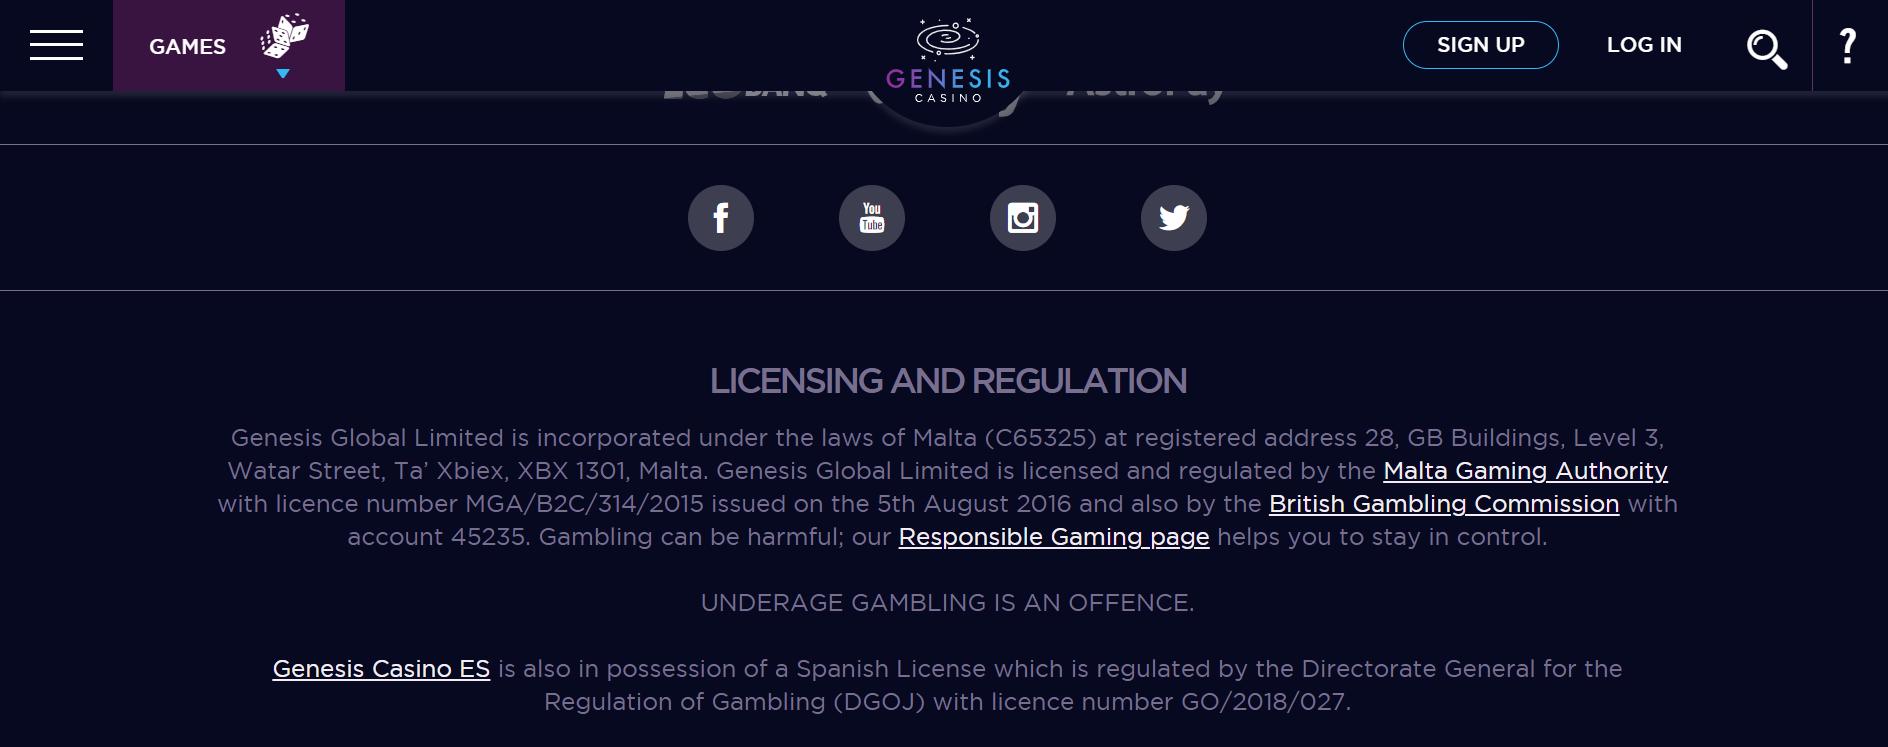 Casino Licence Genesis Casino